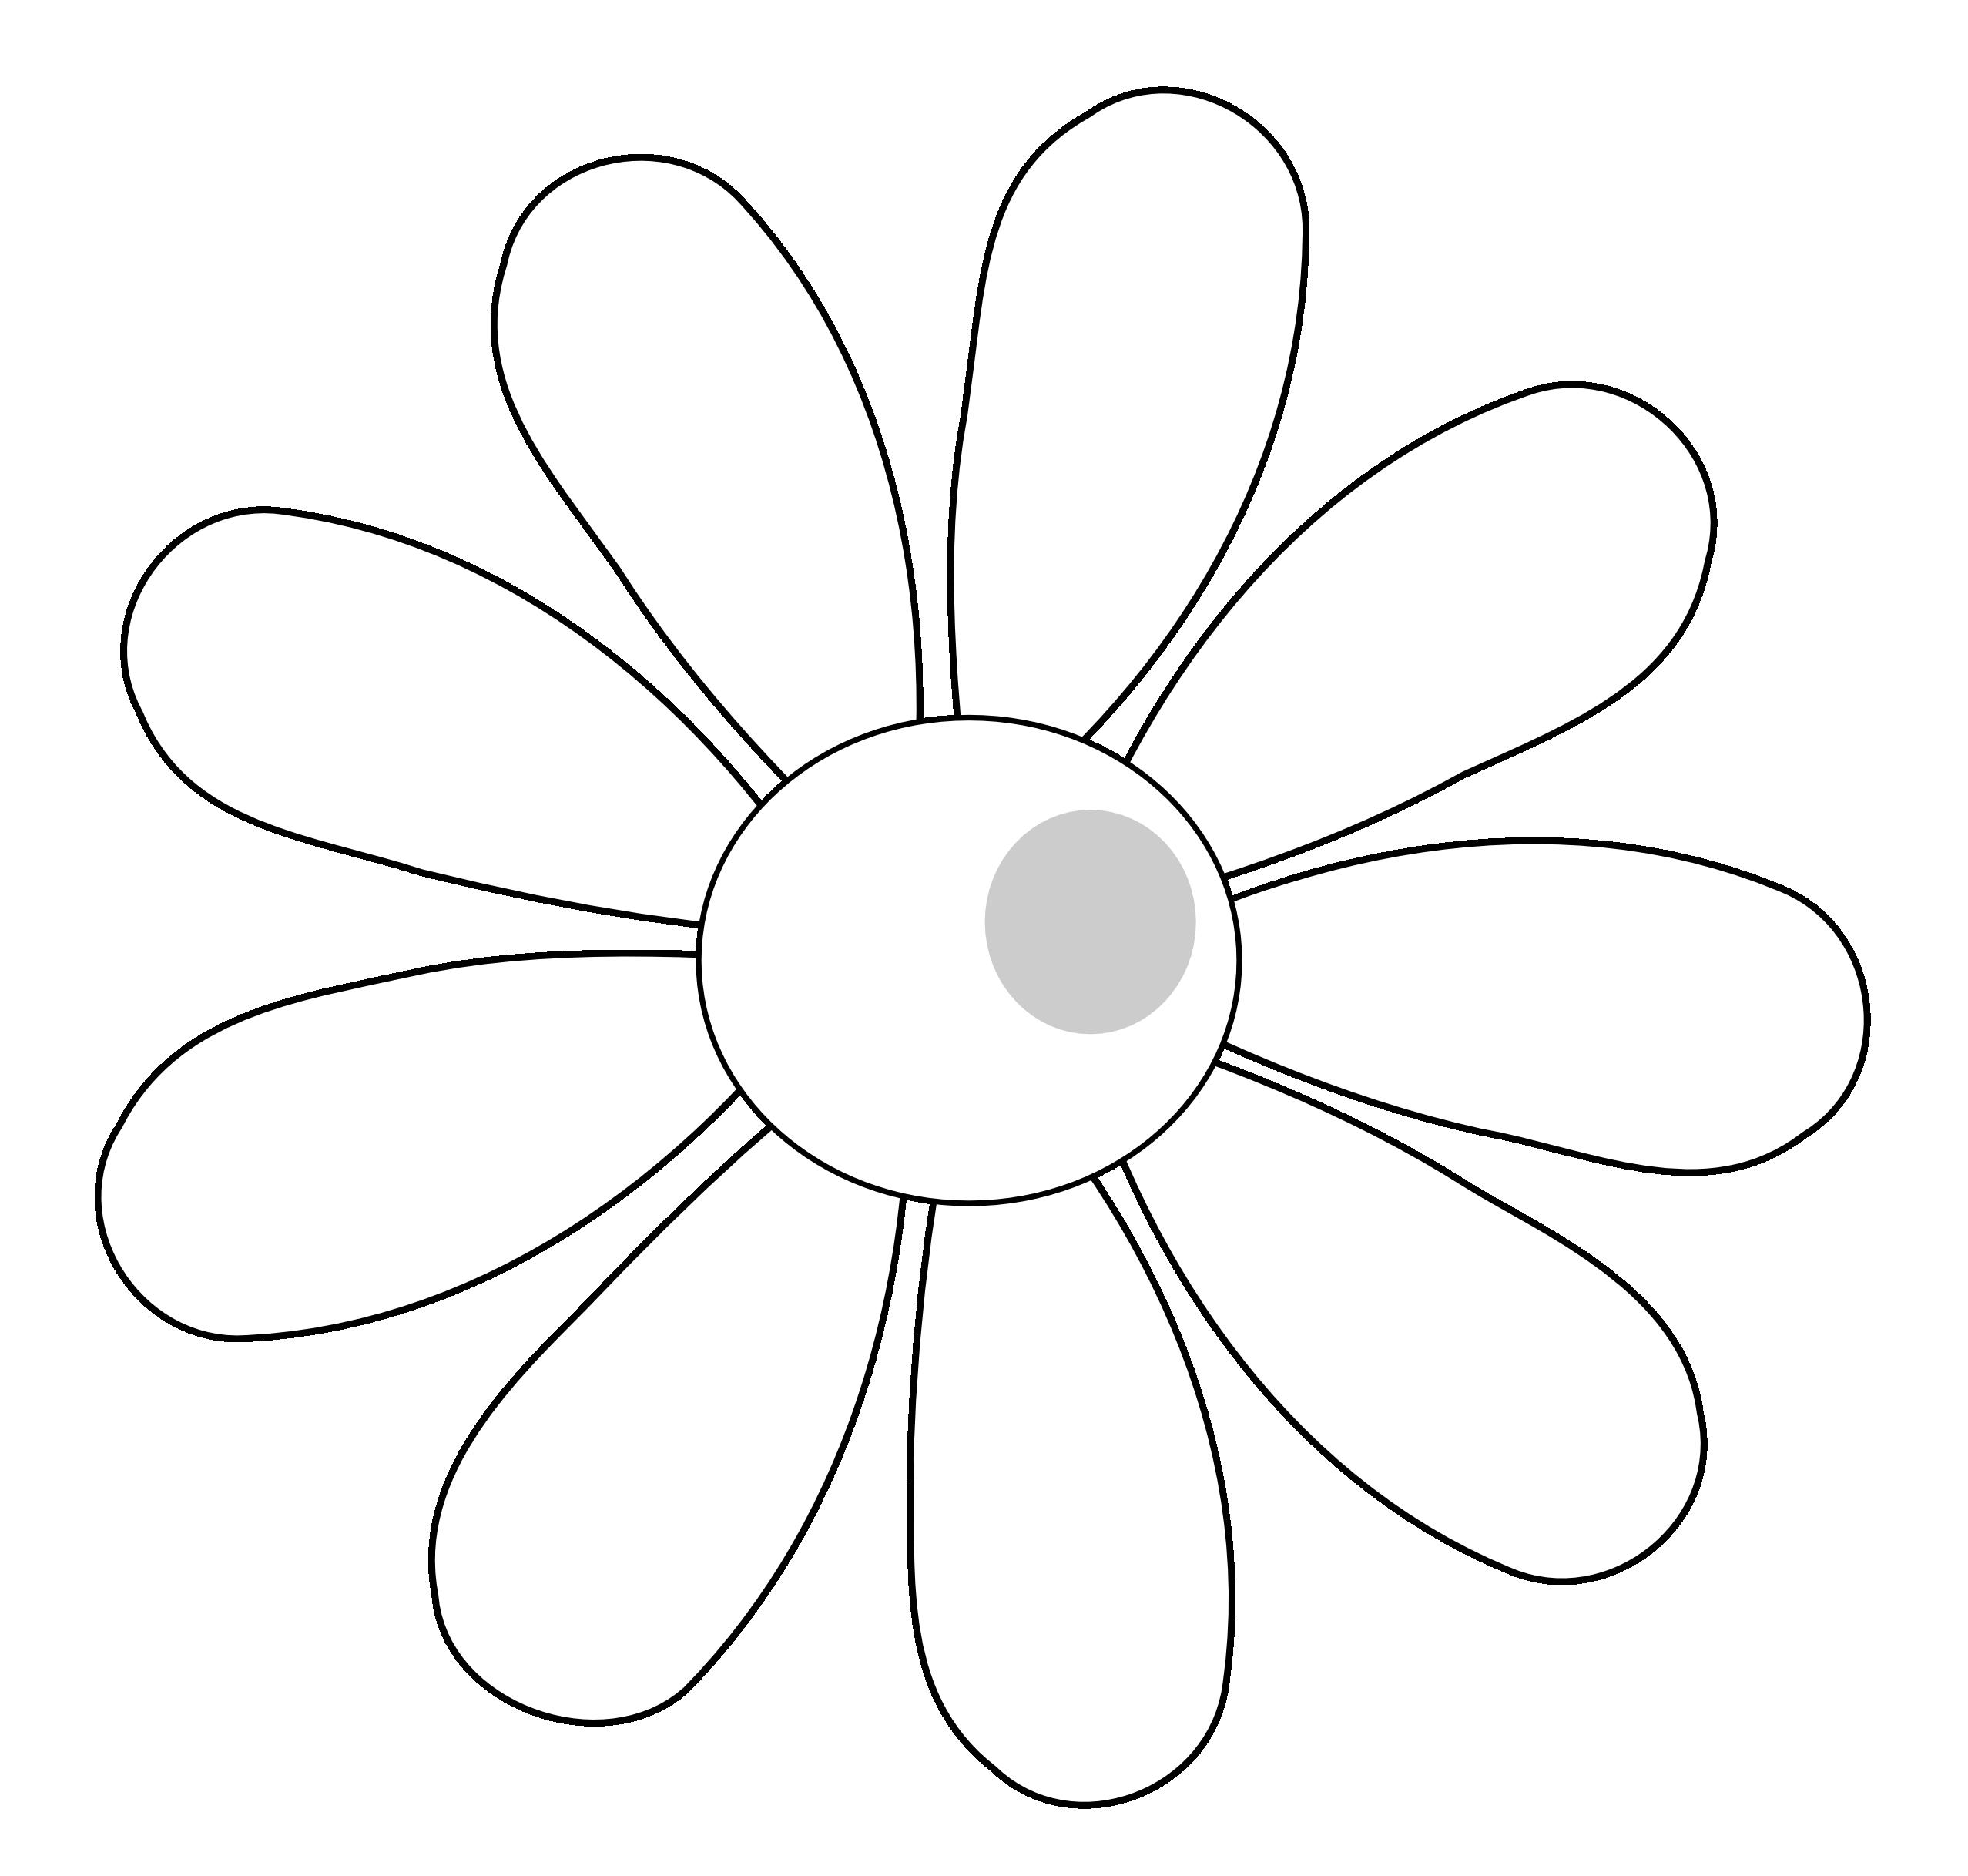 Flower vector clipart clip art library download Singing Daisy Flower - vector Clip Art - Hanslodge Cliparts clip art library download